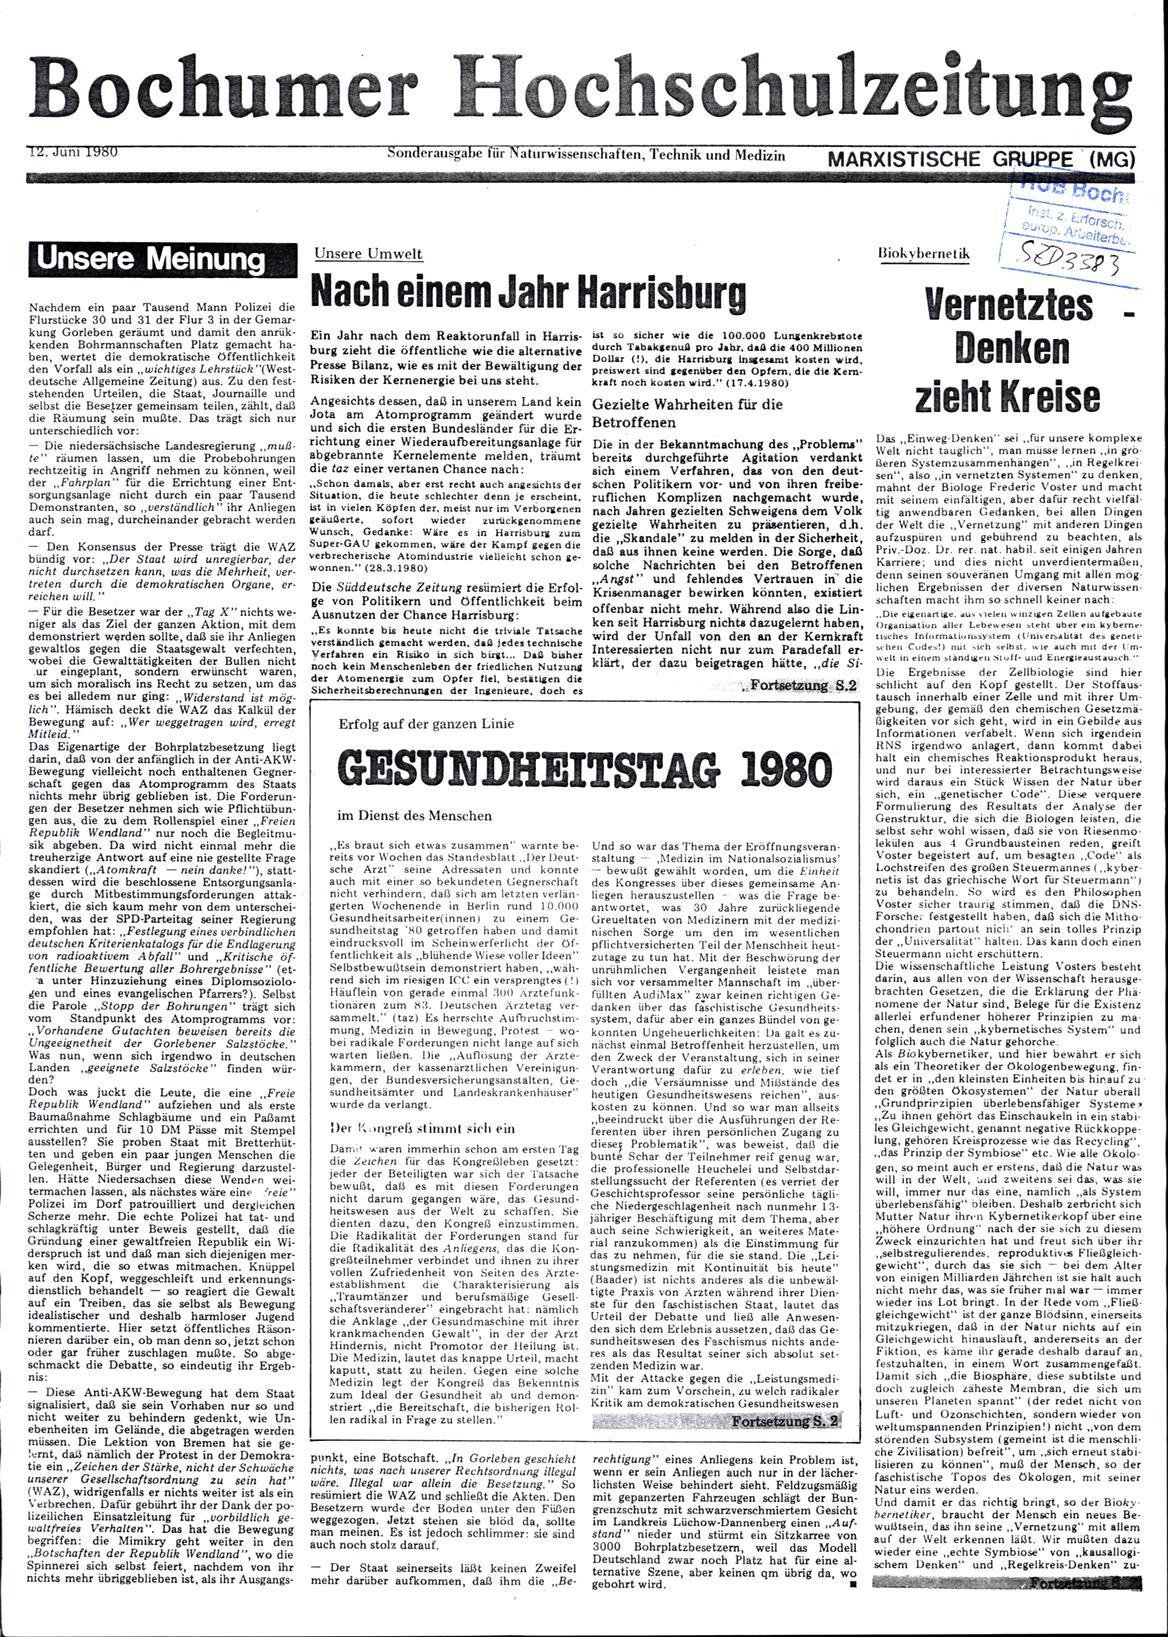 Bochum_BHZ_19800612_Sonder2_001